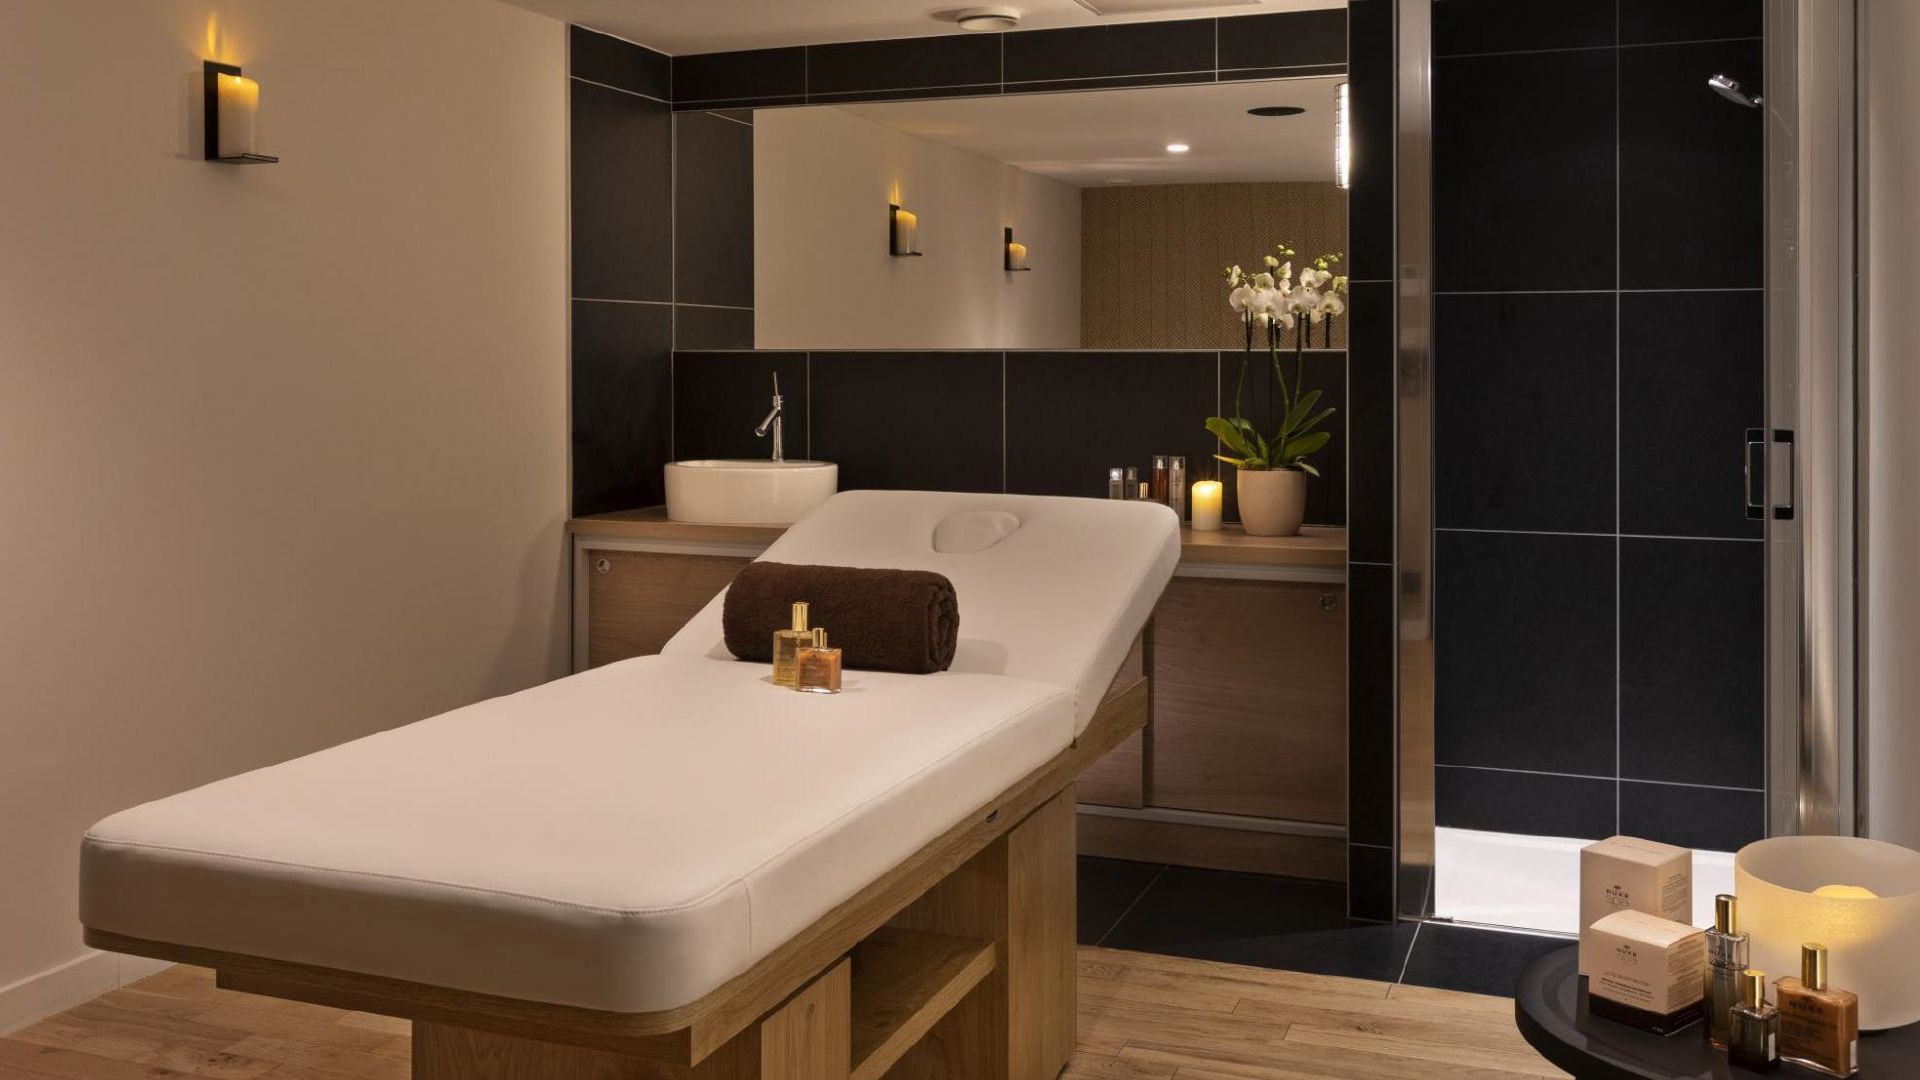 St-Alban Hotel & Spa - cabine de soin simple